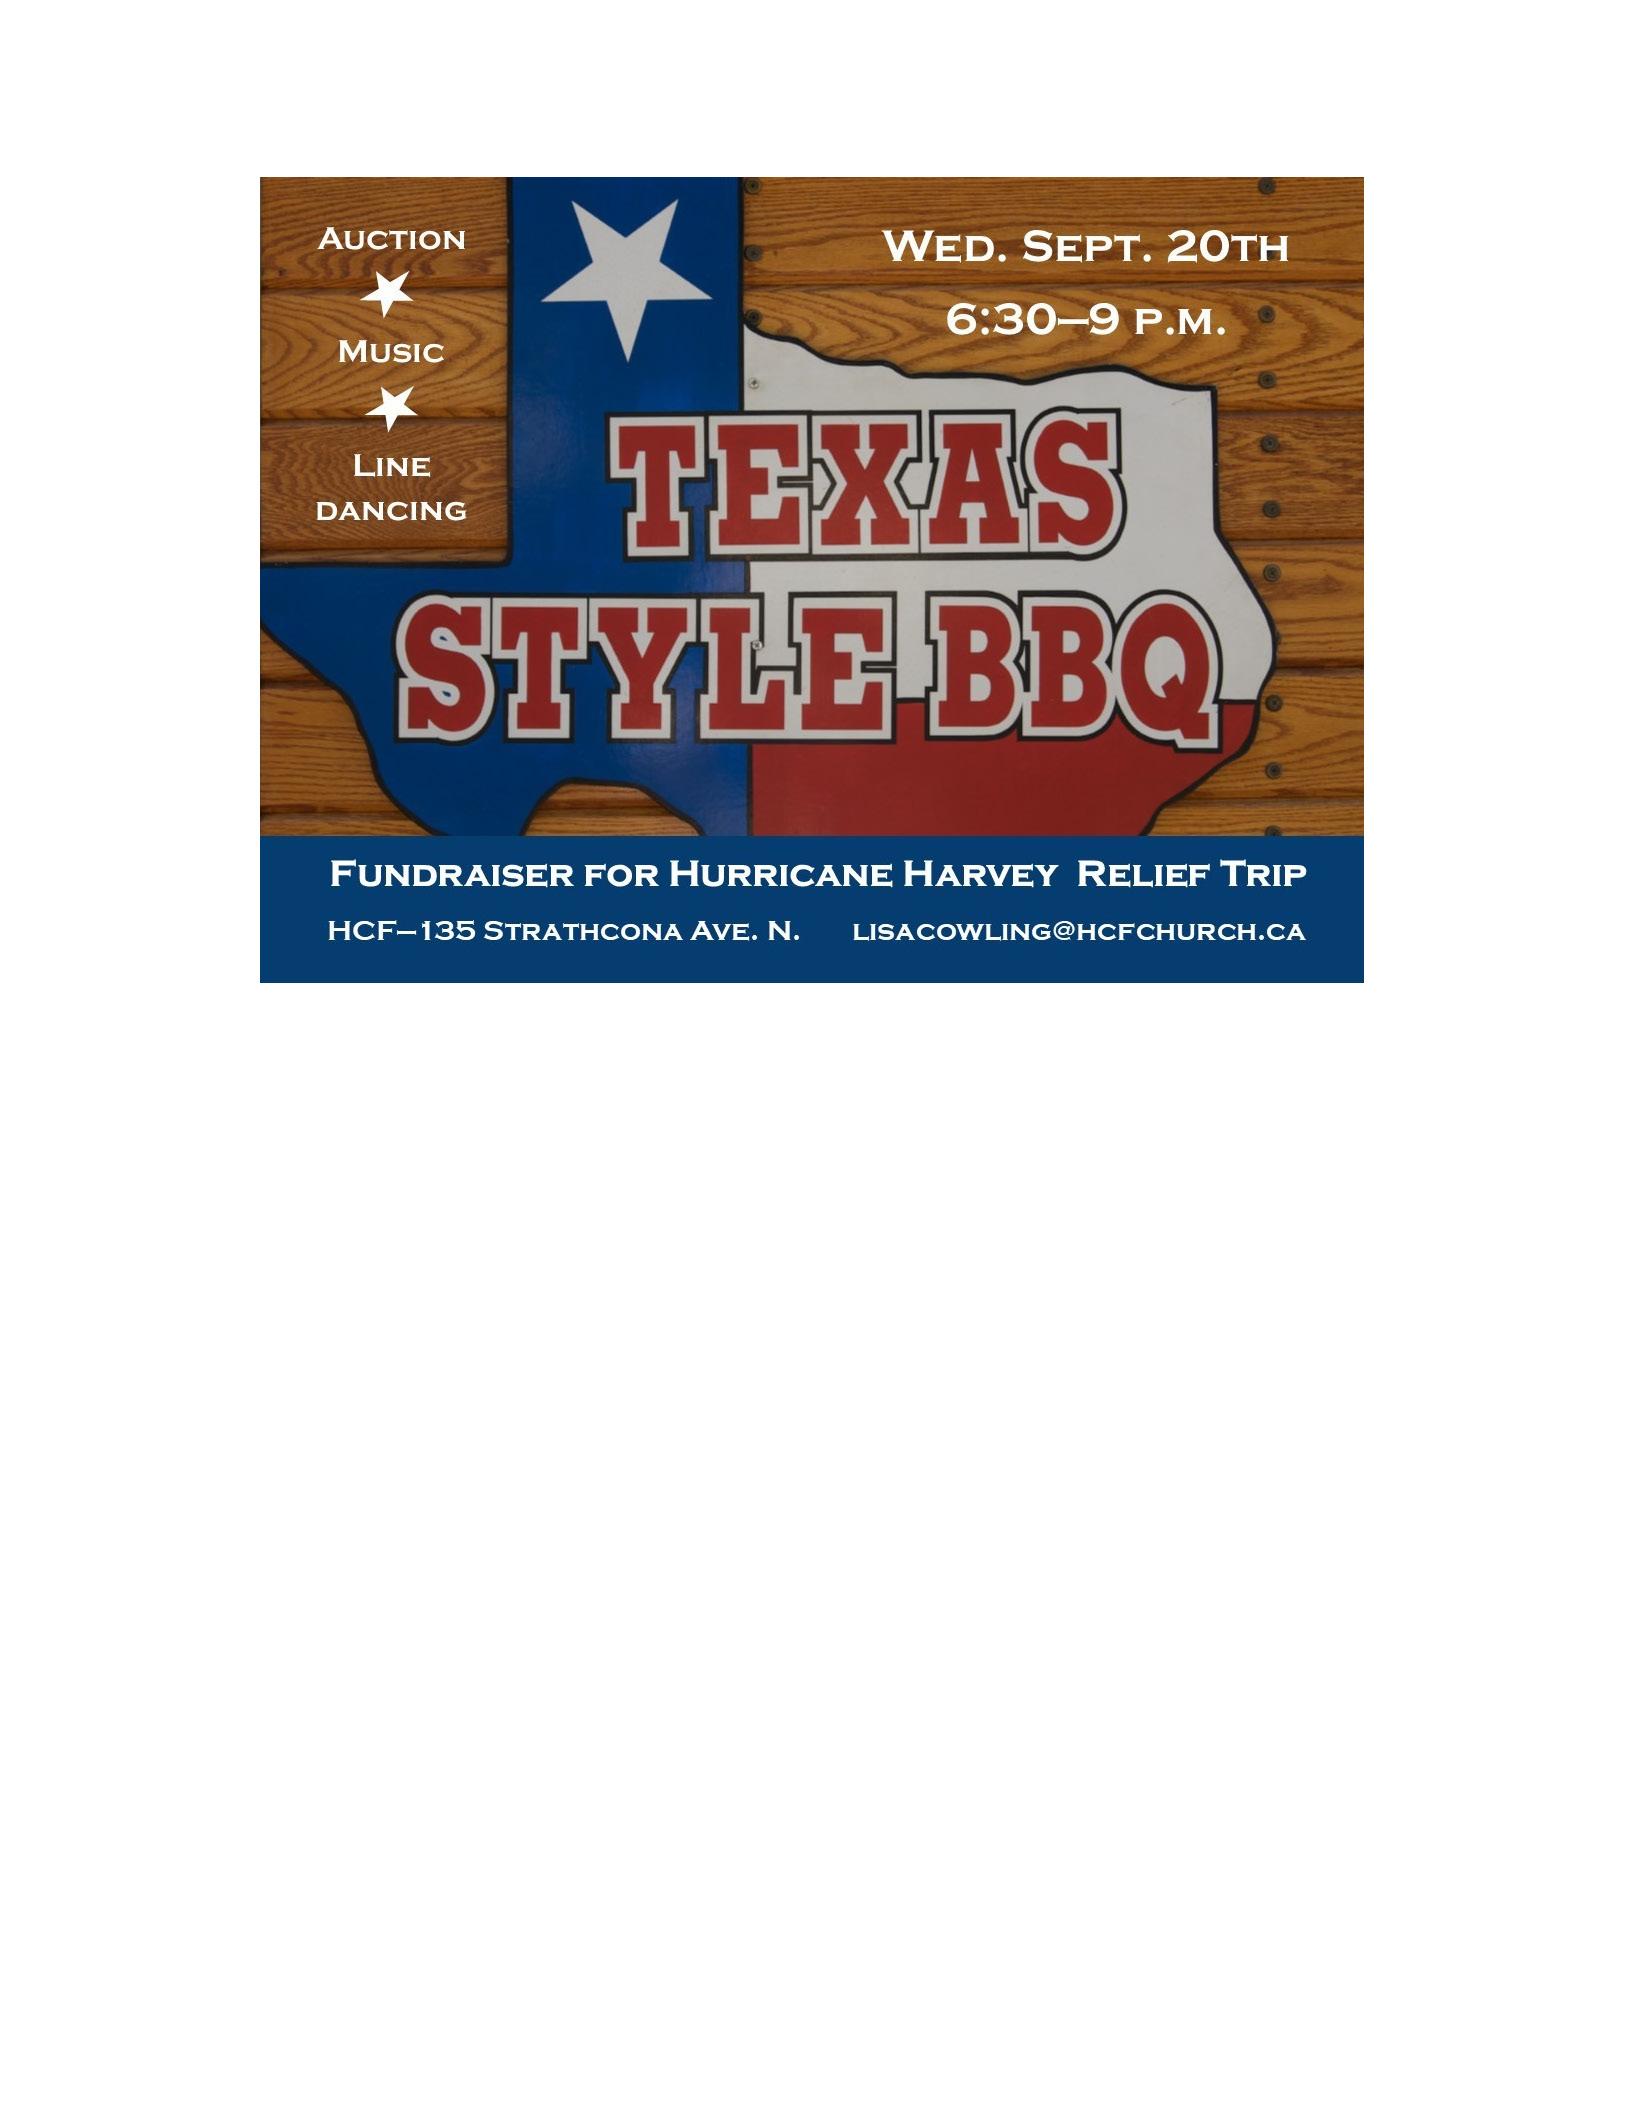 Texas_BBQ_fundraiser_postcard_front_(1)_(2).jpg